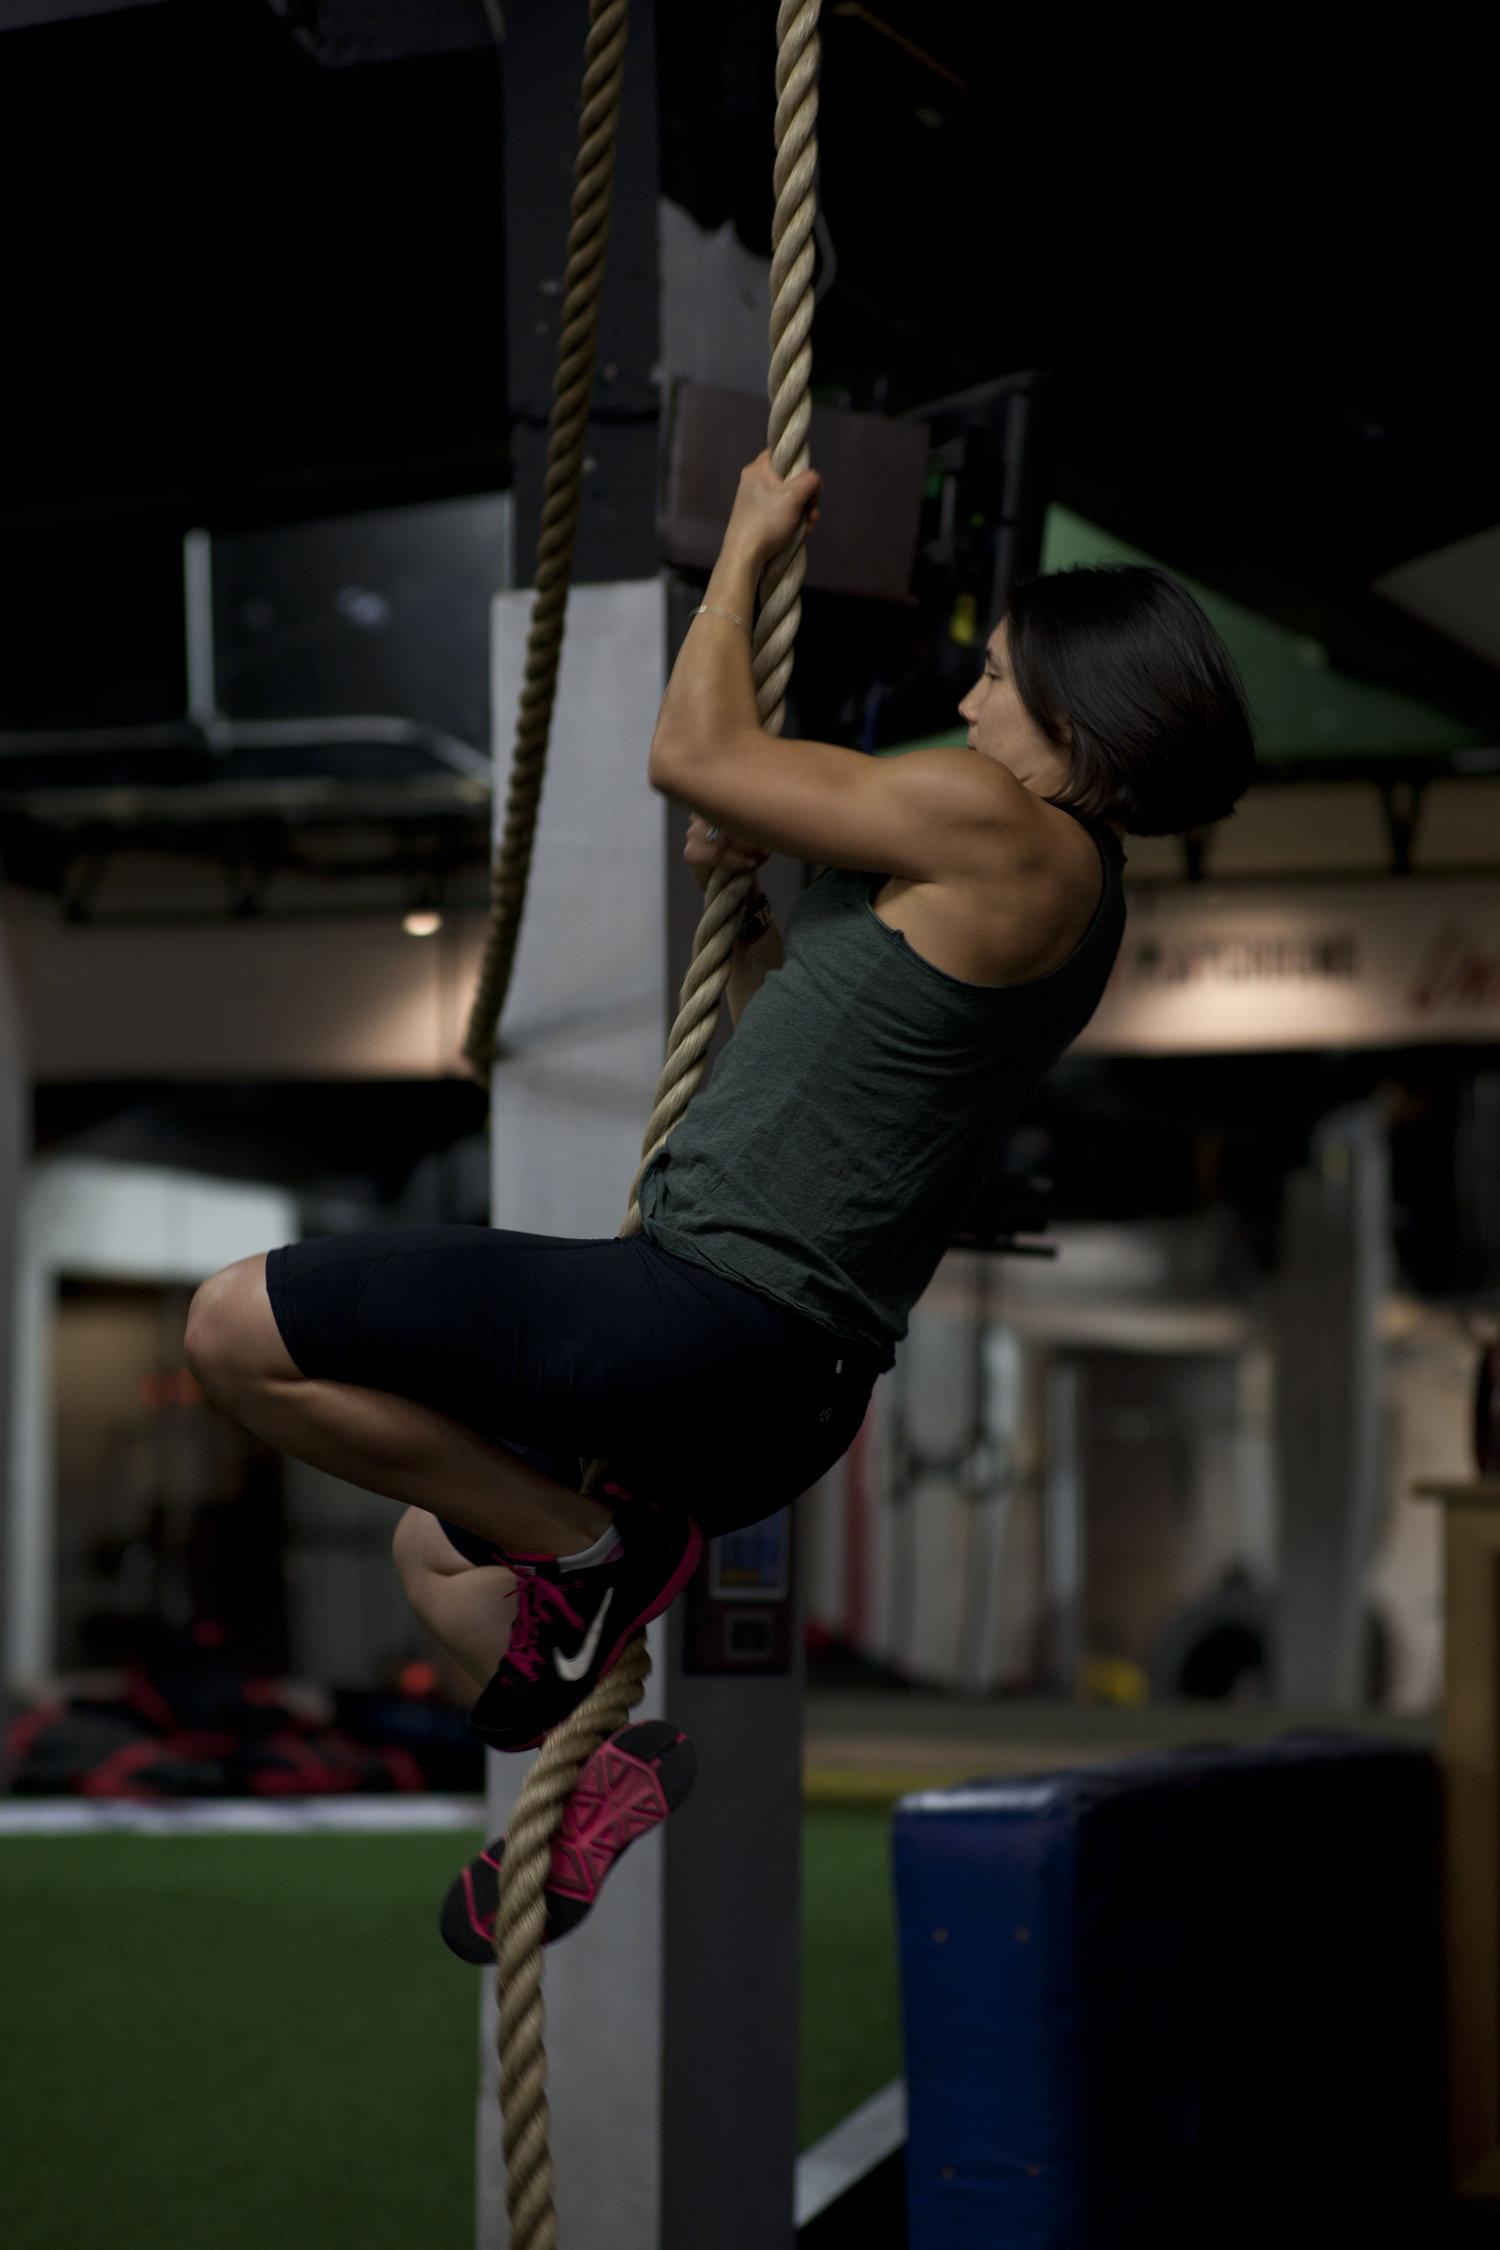 rsz_karen_rope_climb_.jpg